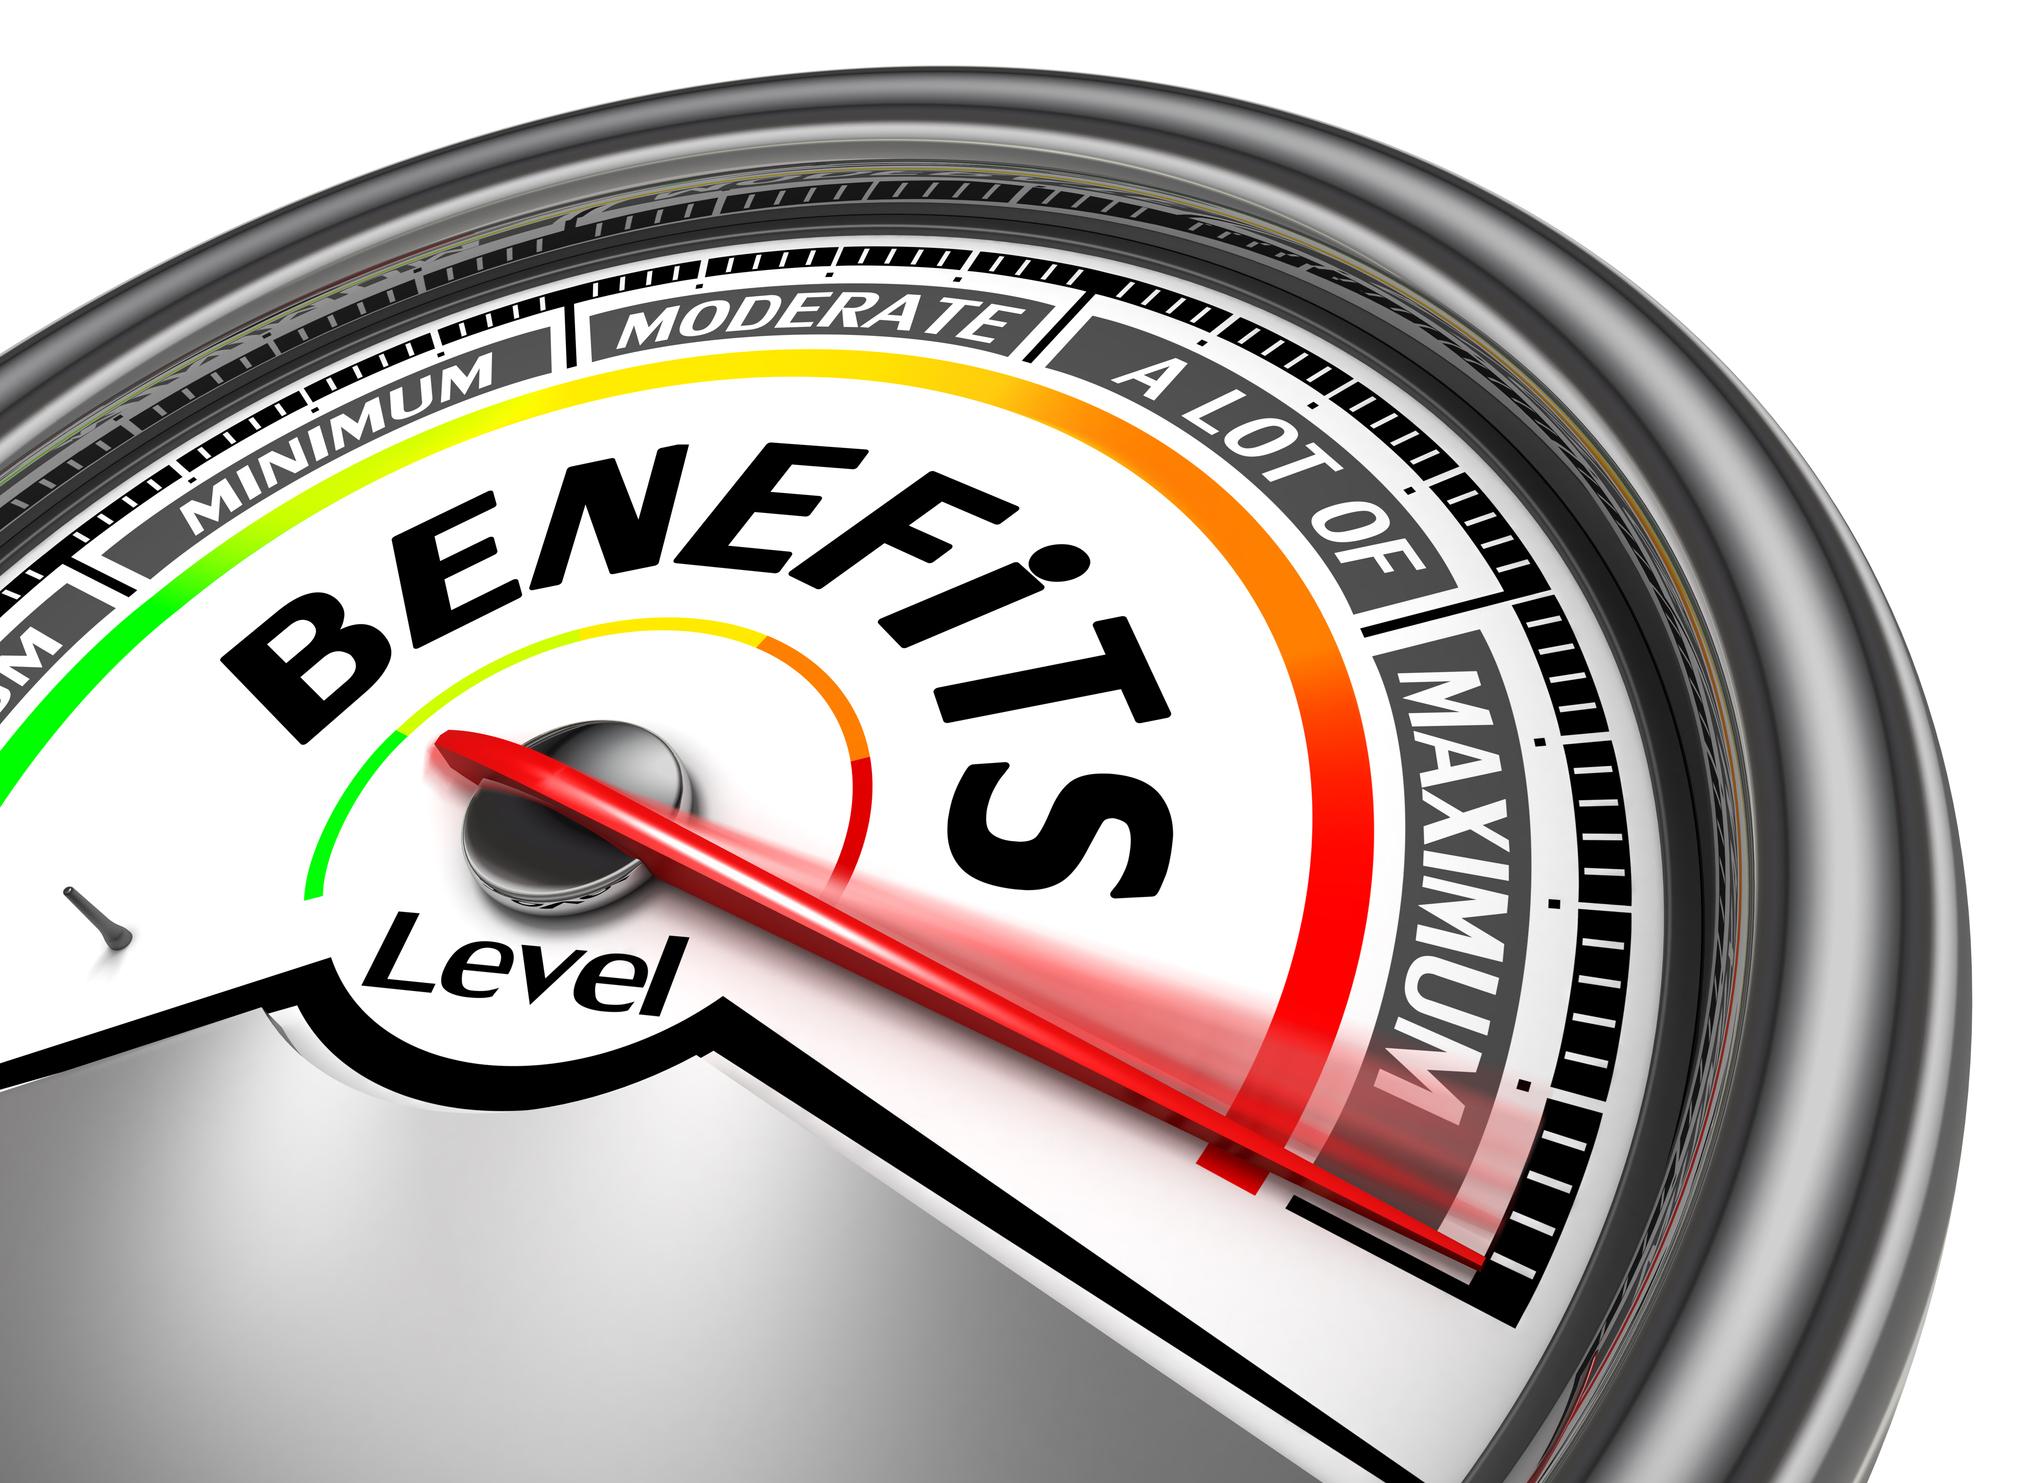 Social Security: 7 Smart Ways To Get More Benefits